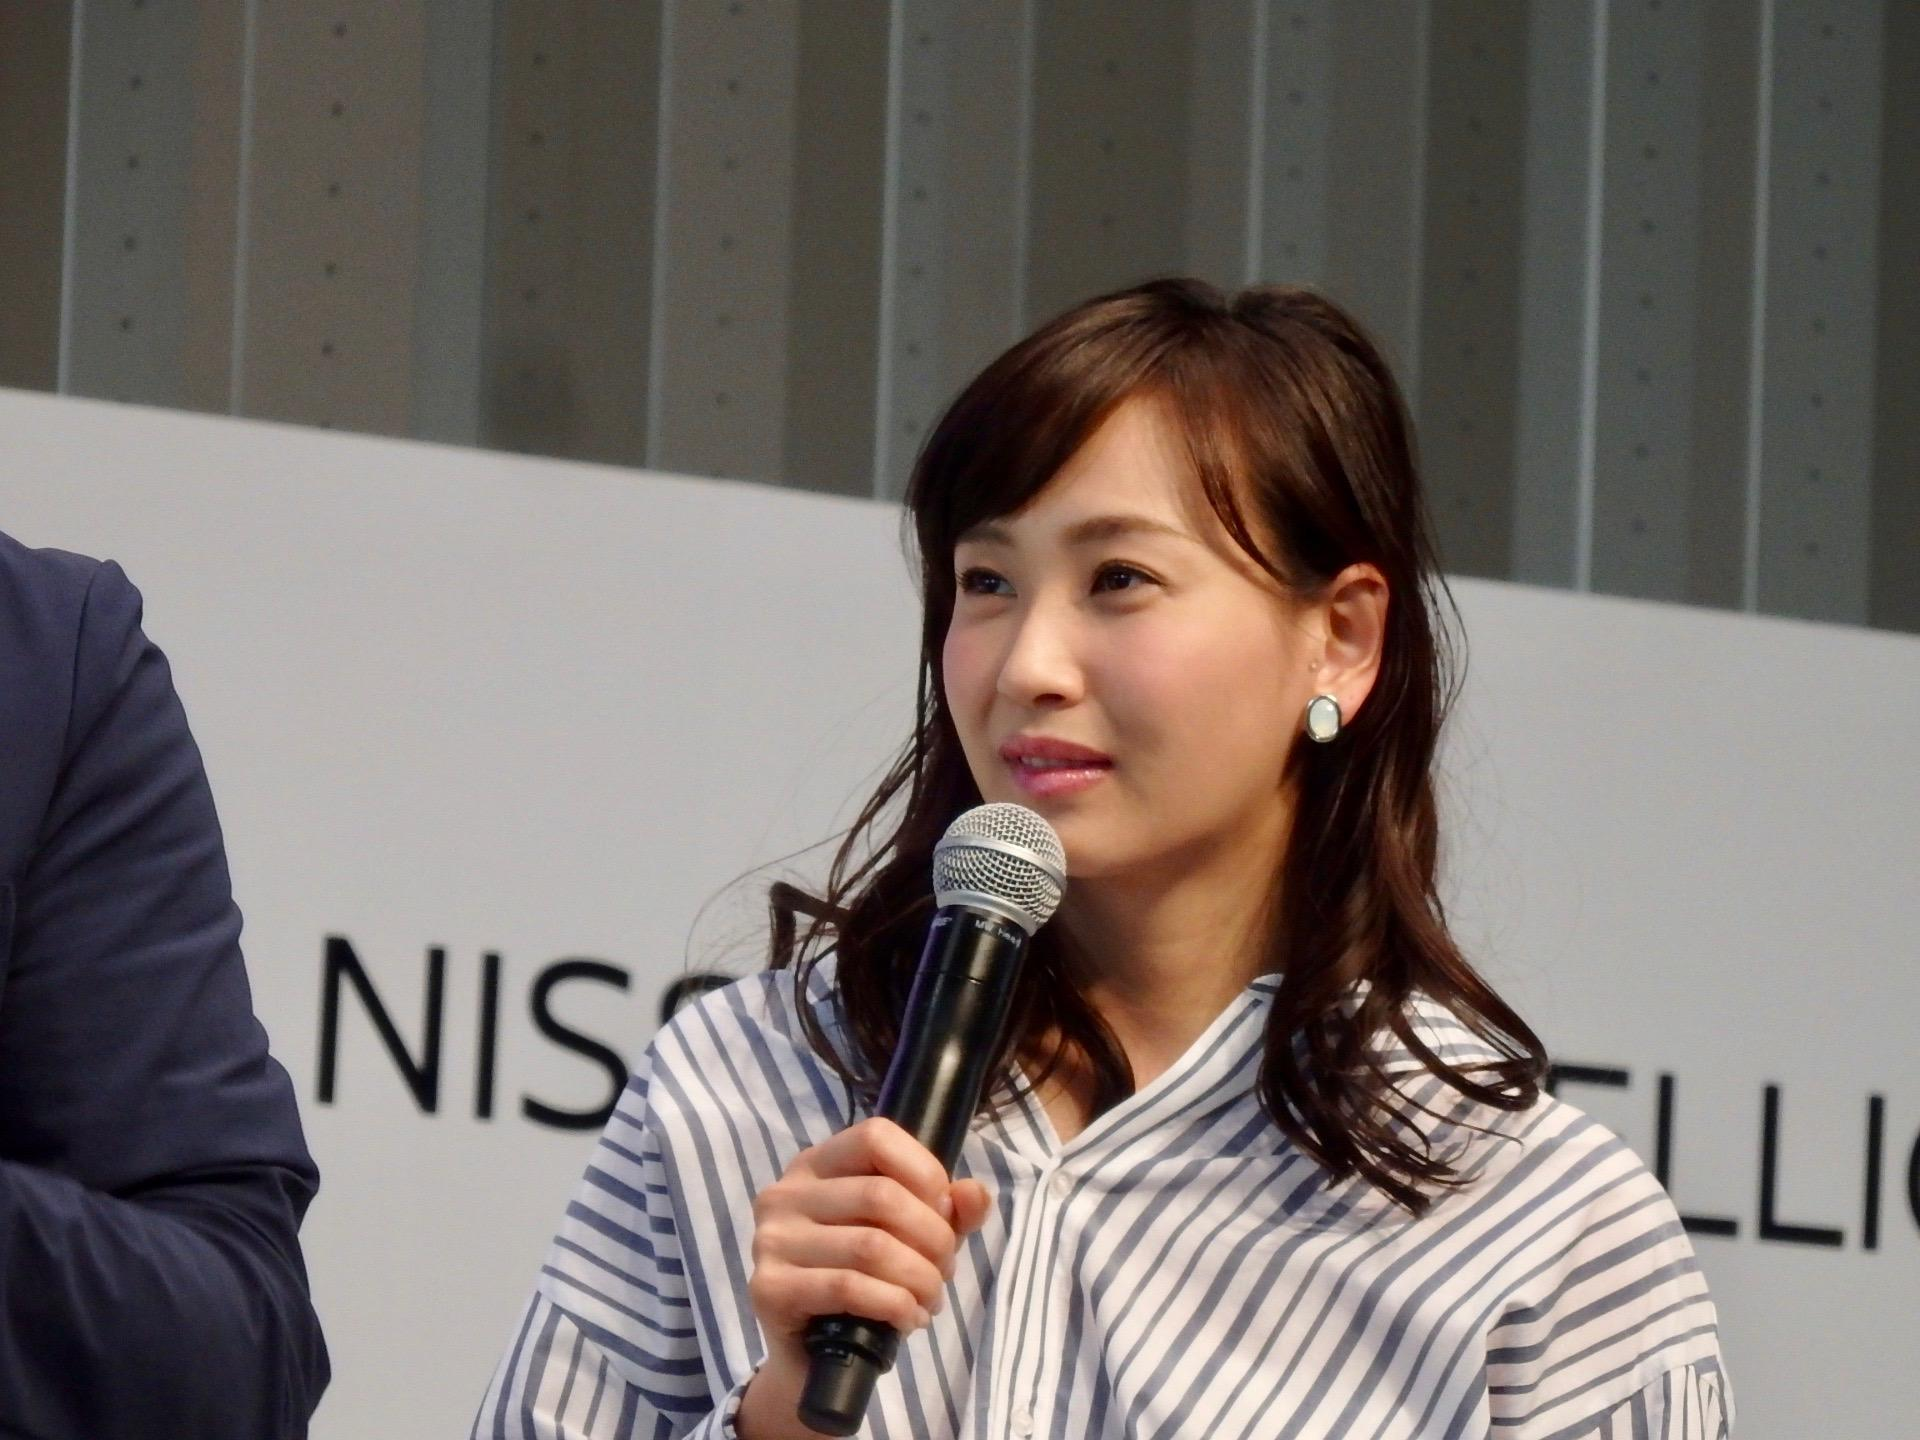 http://news.yoshimoto.co.jp/20180228184142-18198cc623285f6cbb9f2babc5456fe132b4ed5f.jpg